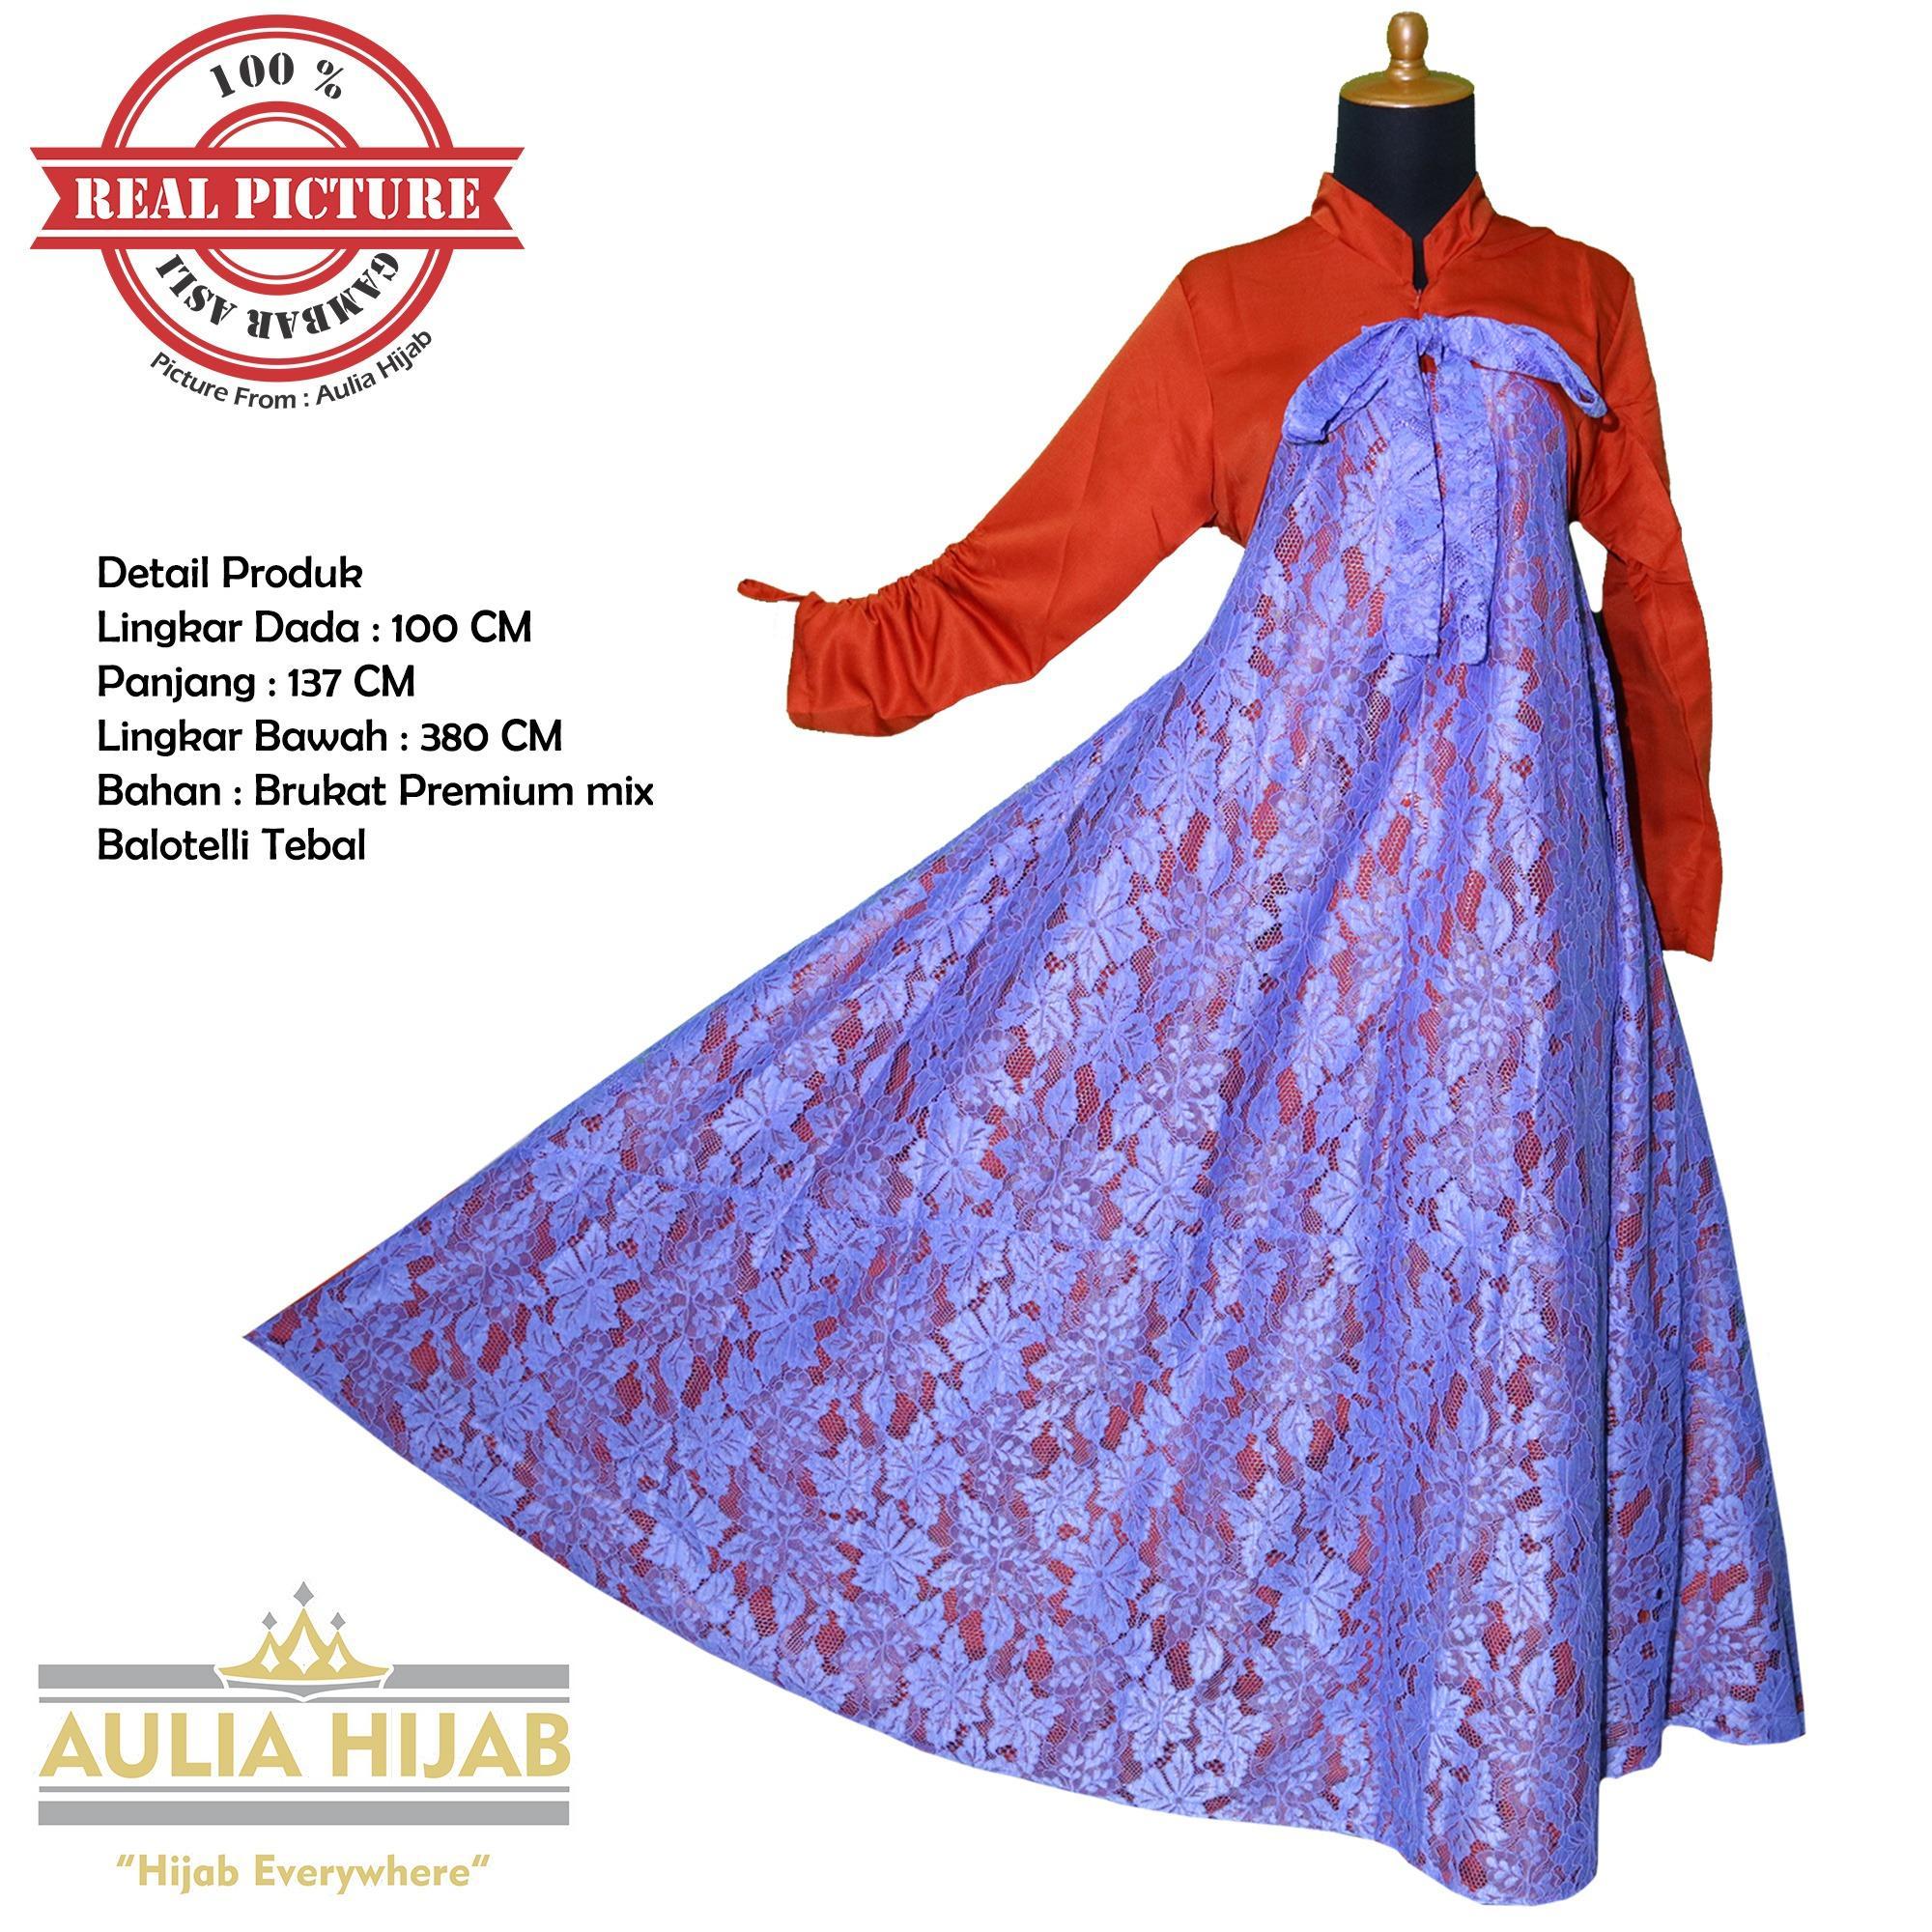 Diskon Aulia Hijab Gamis Brukat Asli Alina Dress Bahan Brukat Gamis Pesta Gamis Kerja Gamis Kondangan Gamis Brukat Gamis Brokat Gamis Terbaru Gamis Real Picture Gamis Cantik Aulia Di Riau